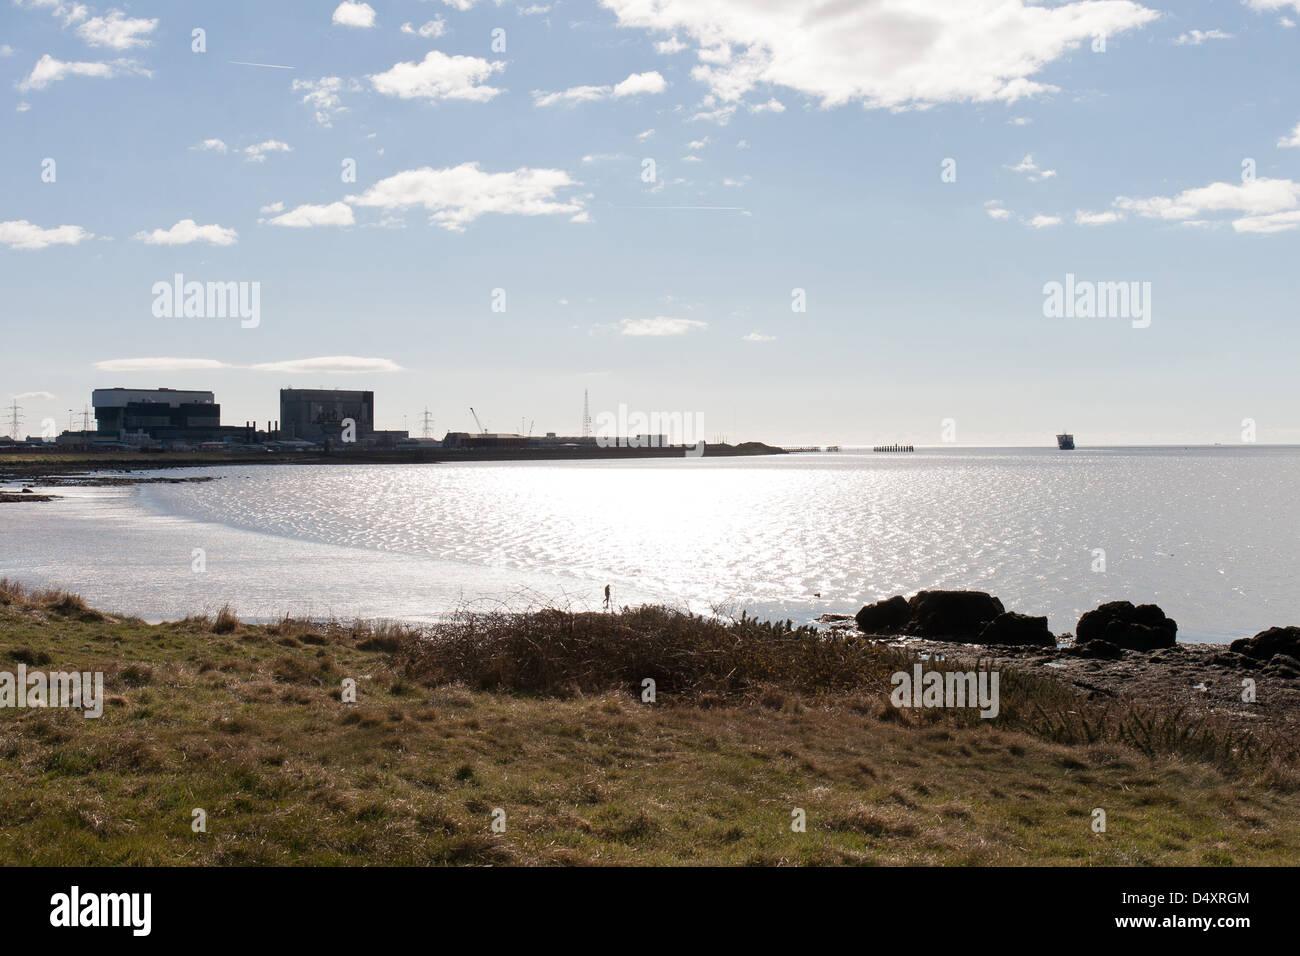 Heysham Lancashire, England with the power station silhouetted - Stock Image